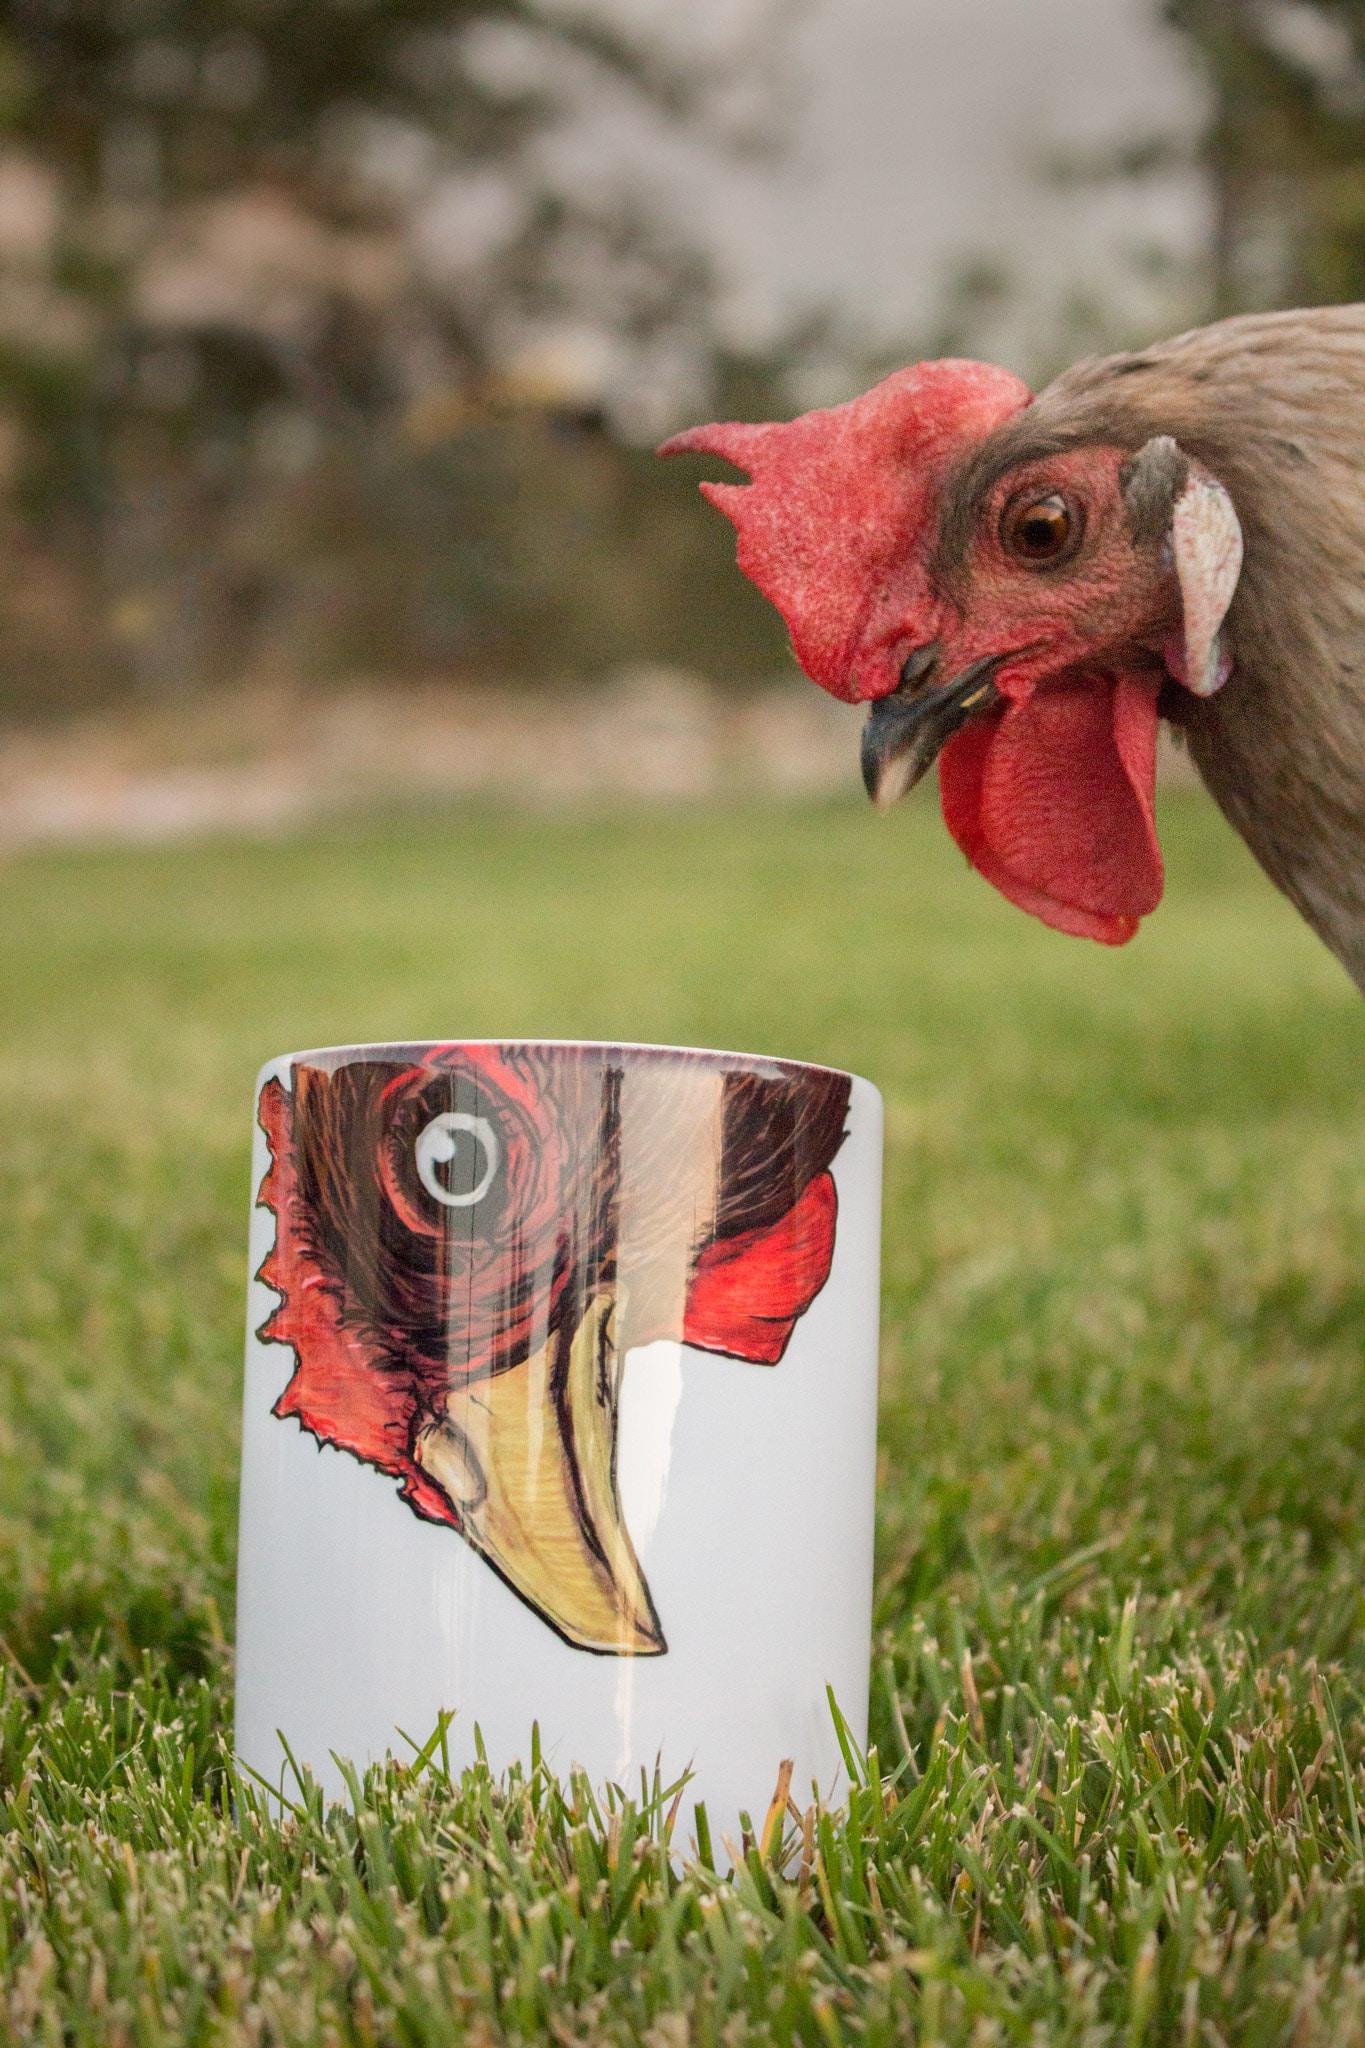 Chari Laree Photography Chicken With A Mug In A Yard